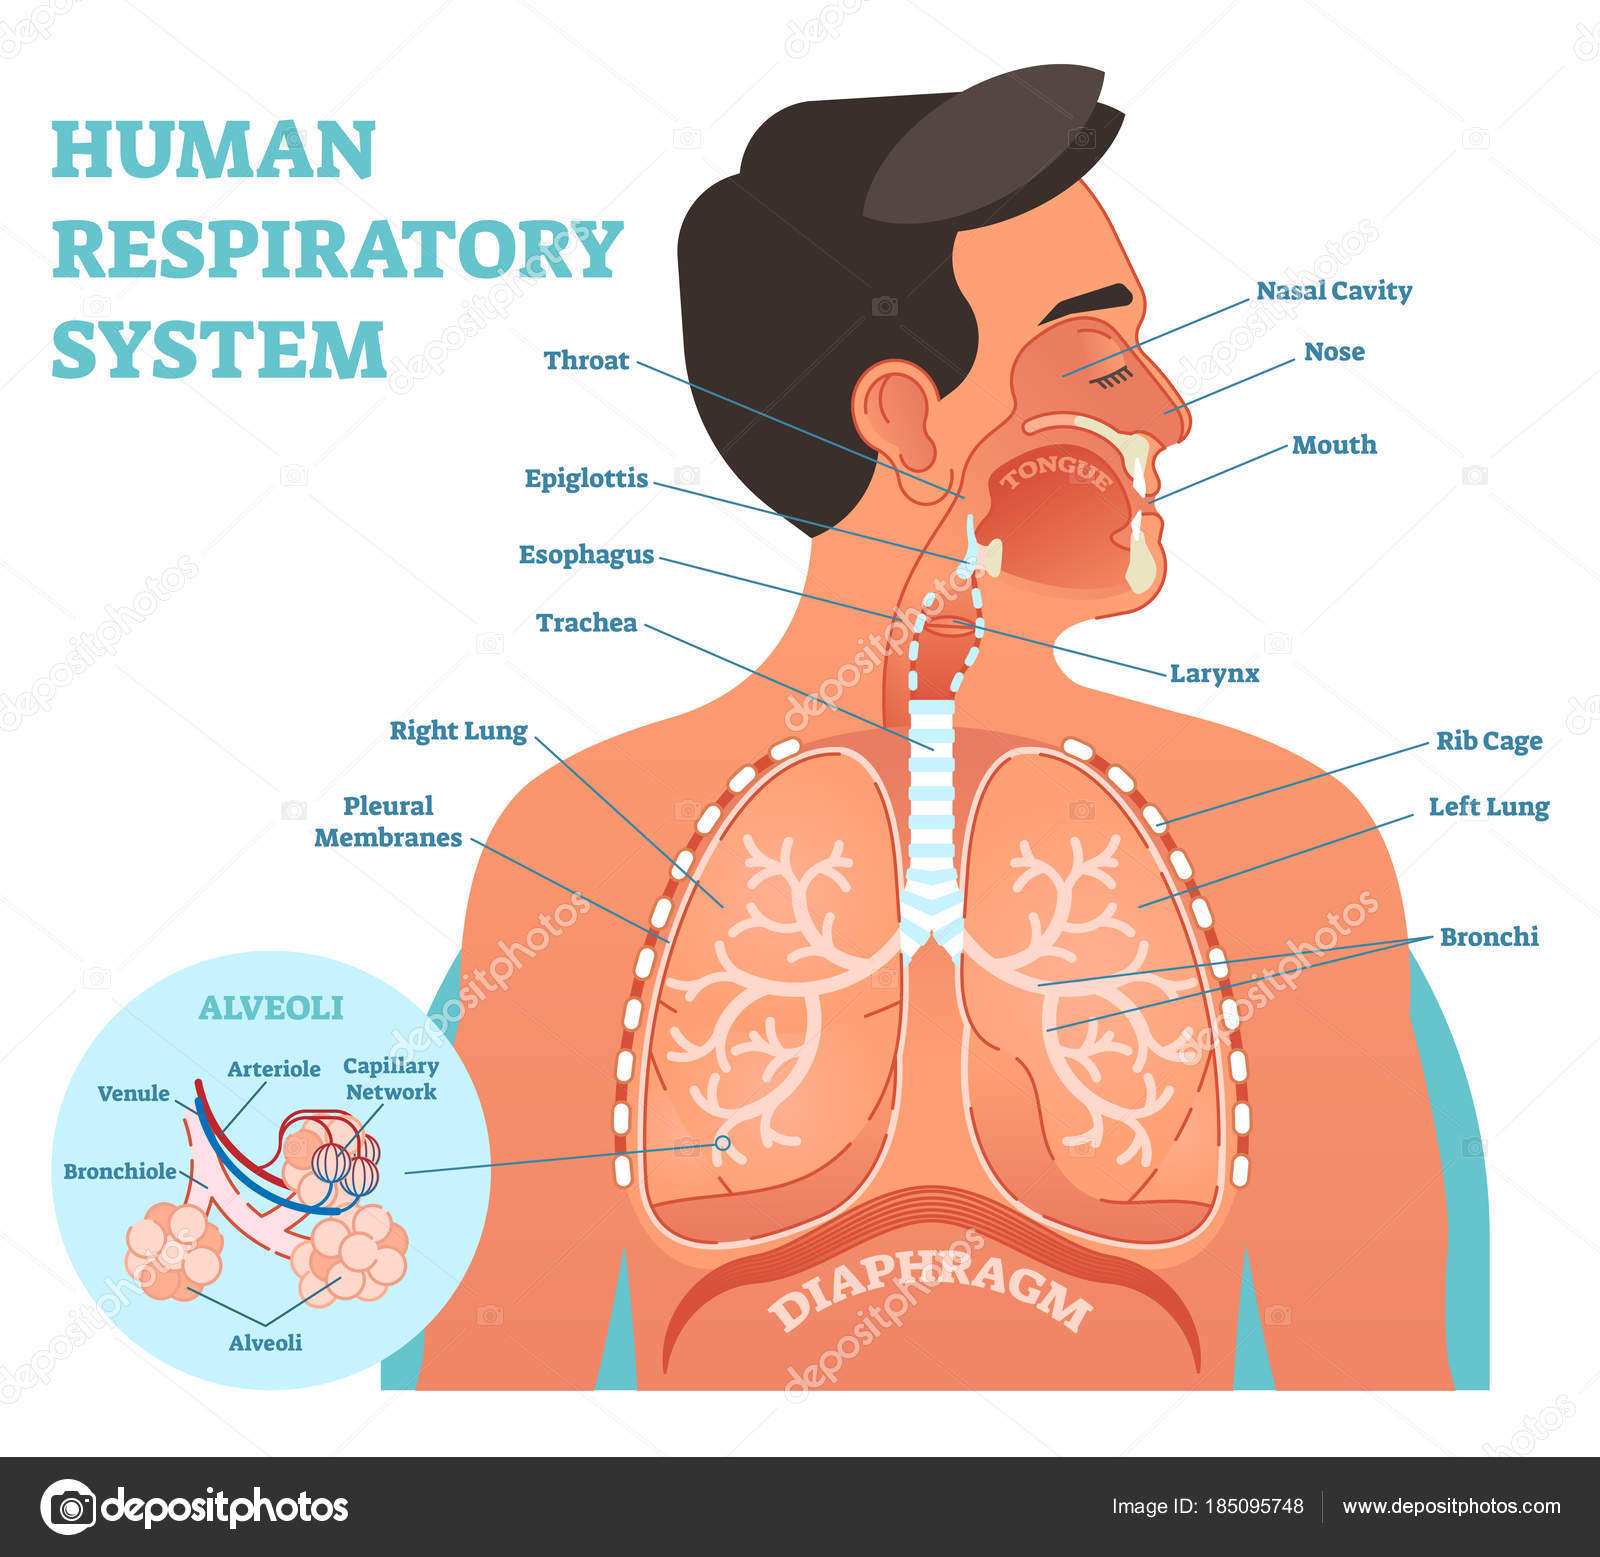 Diagram Of Respiratory System Human Respiratory System Anatomical Vector Illustration Medical